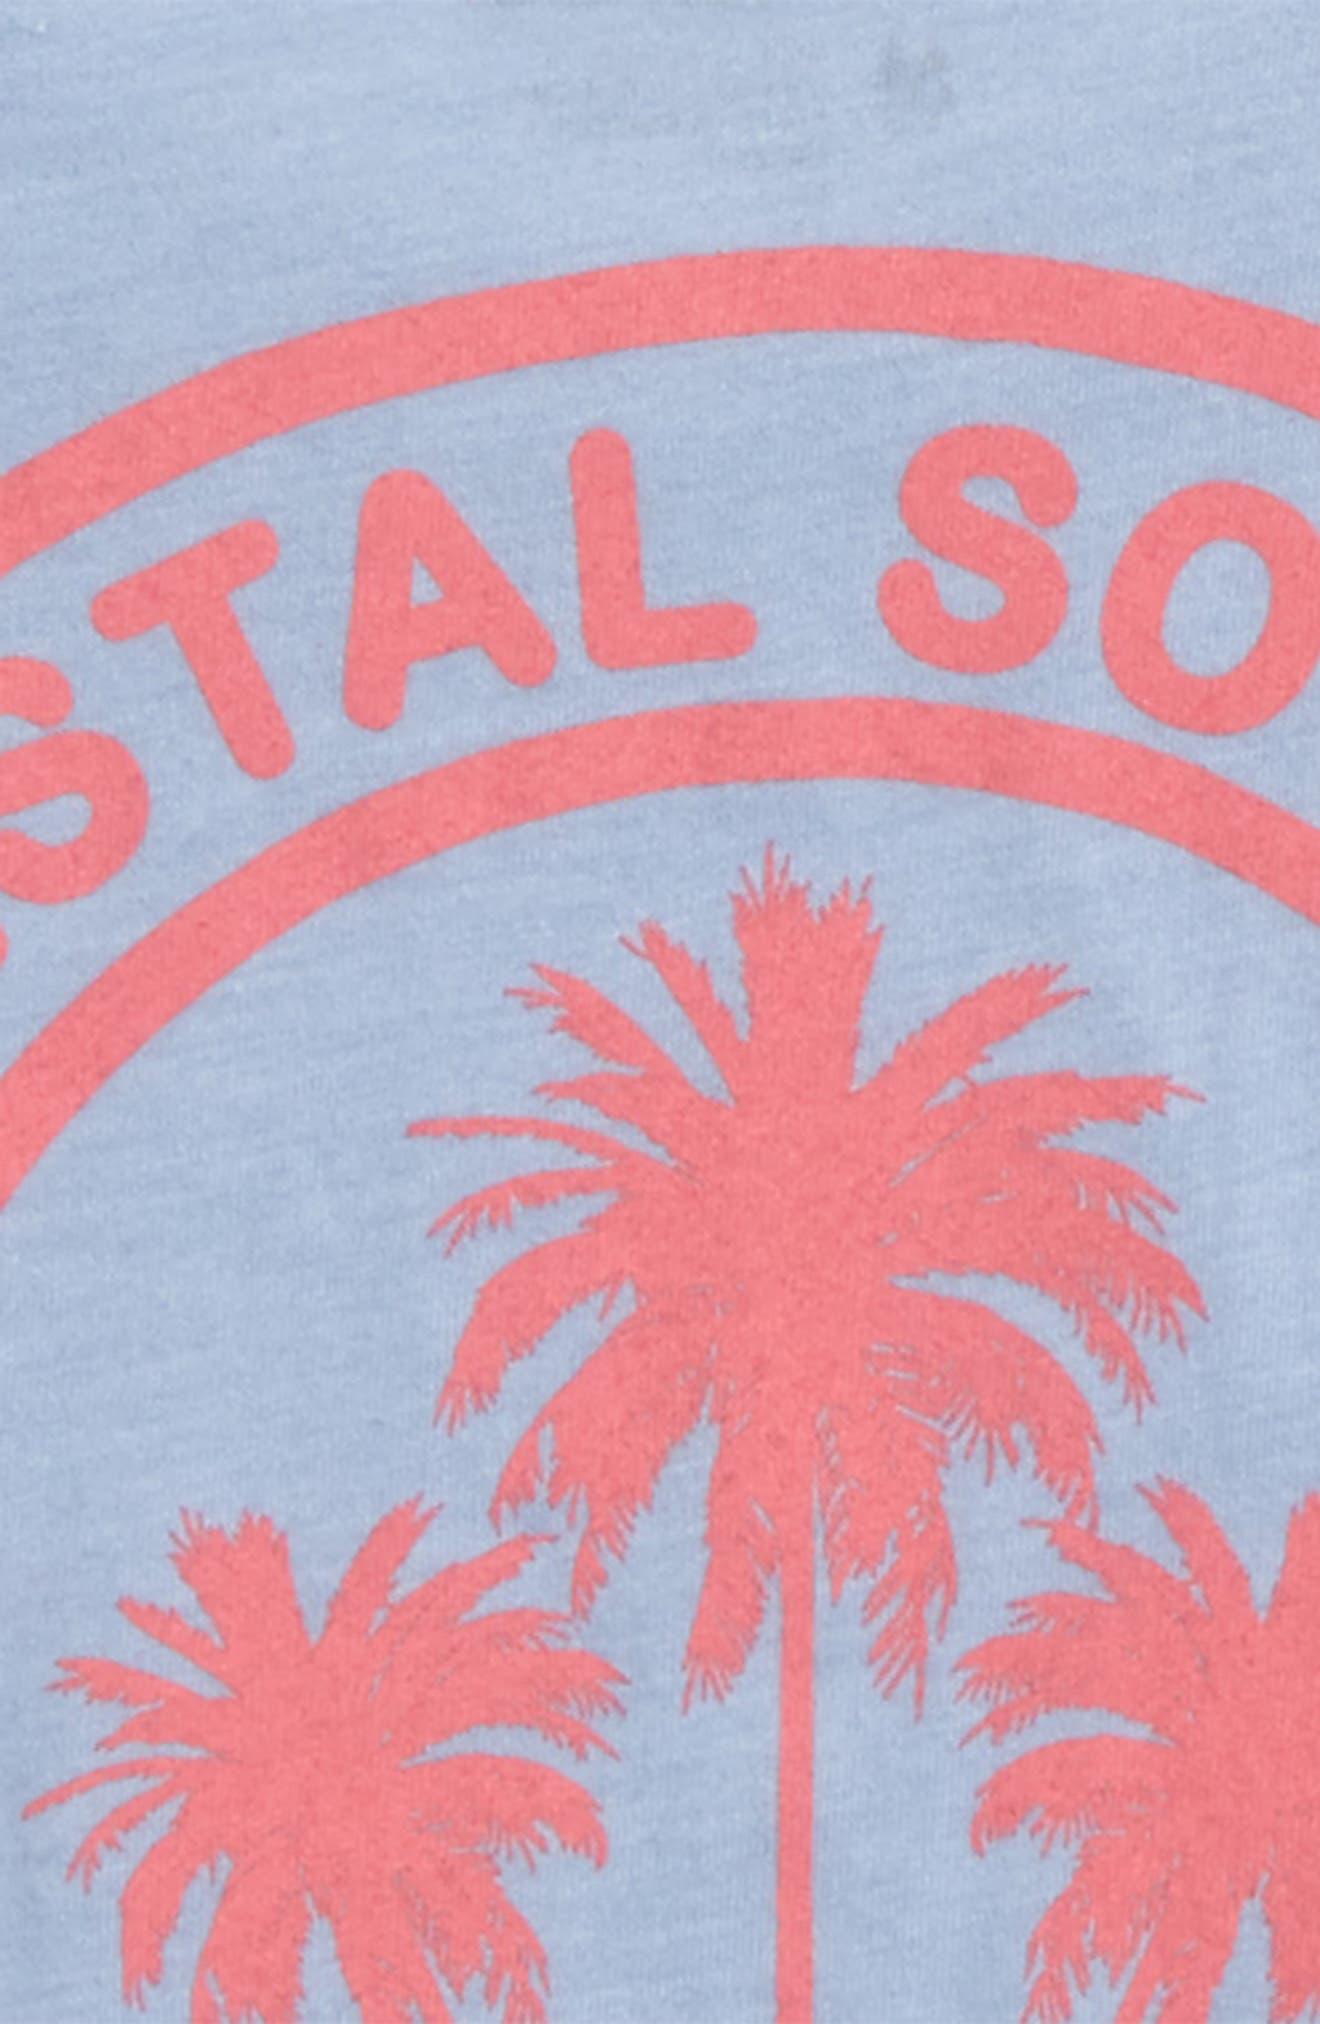 Coastal Society Graphic Tee,                             Alternate thumbnail 3, color,                             423